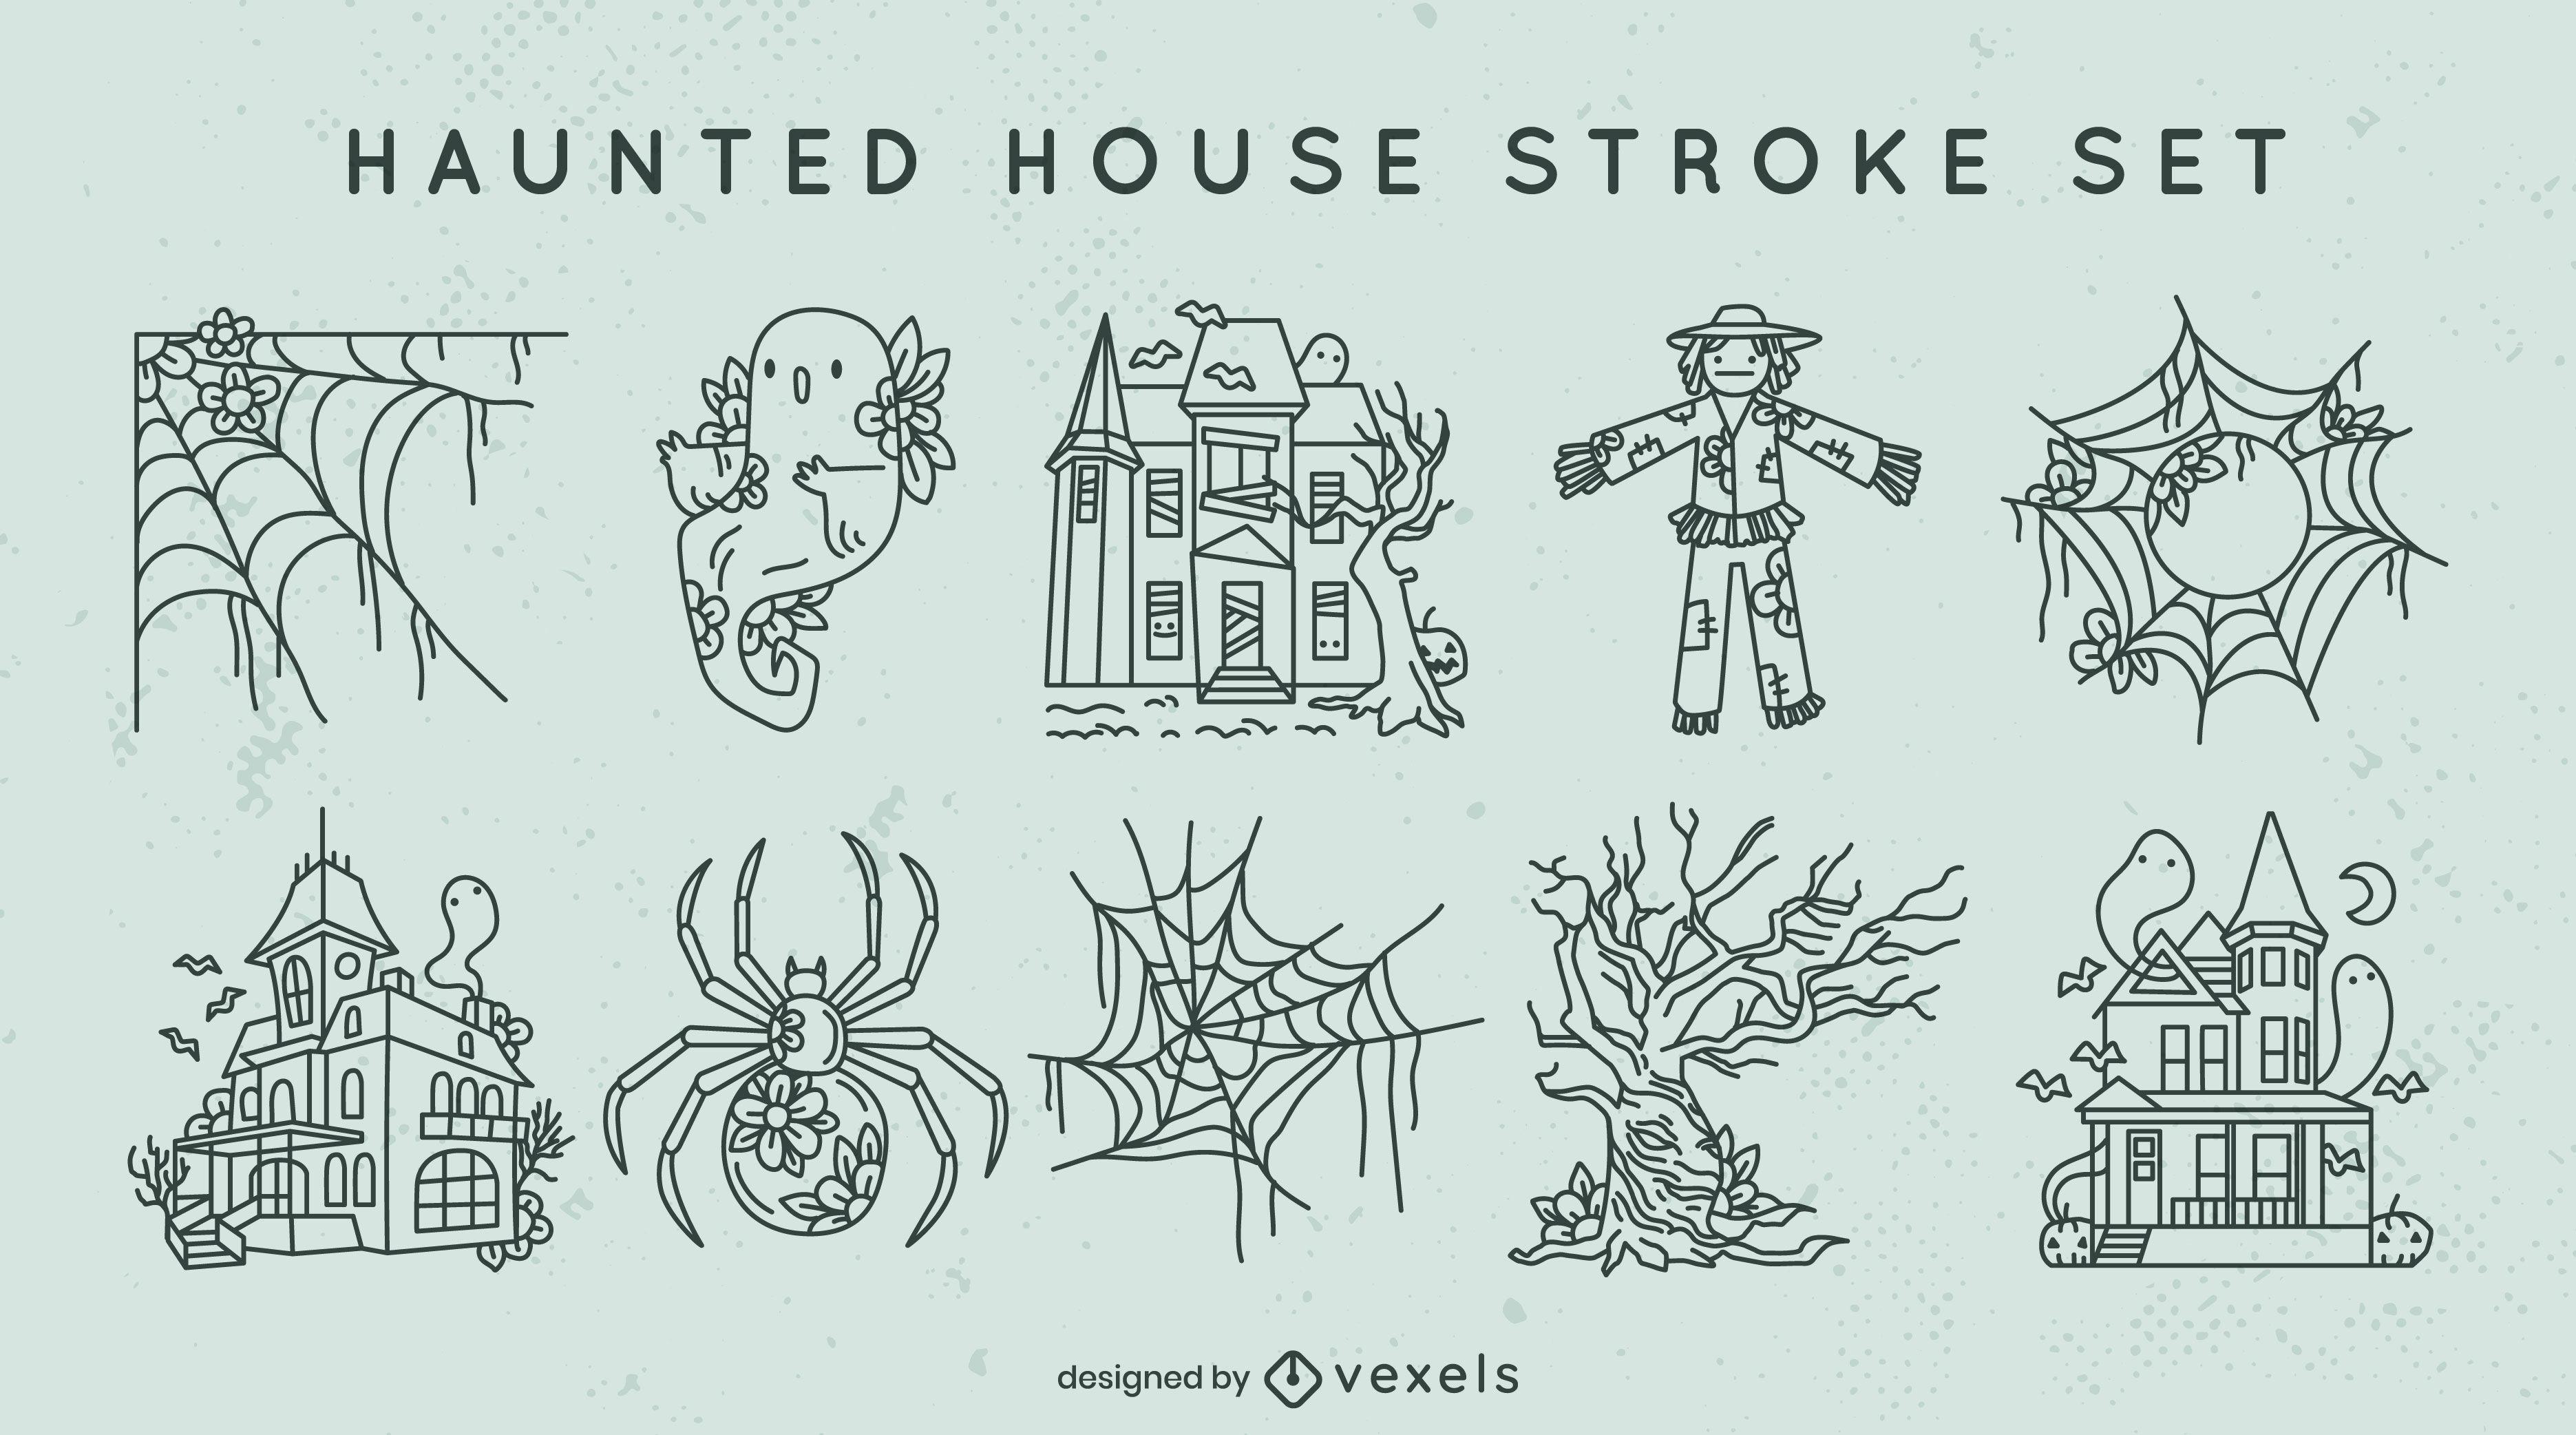 Haunted house stroke set